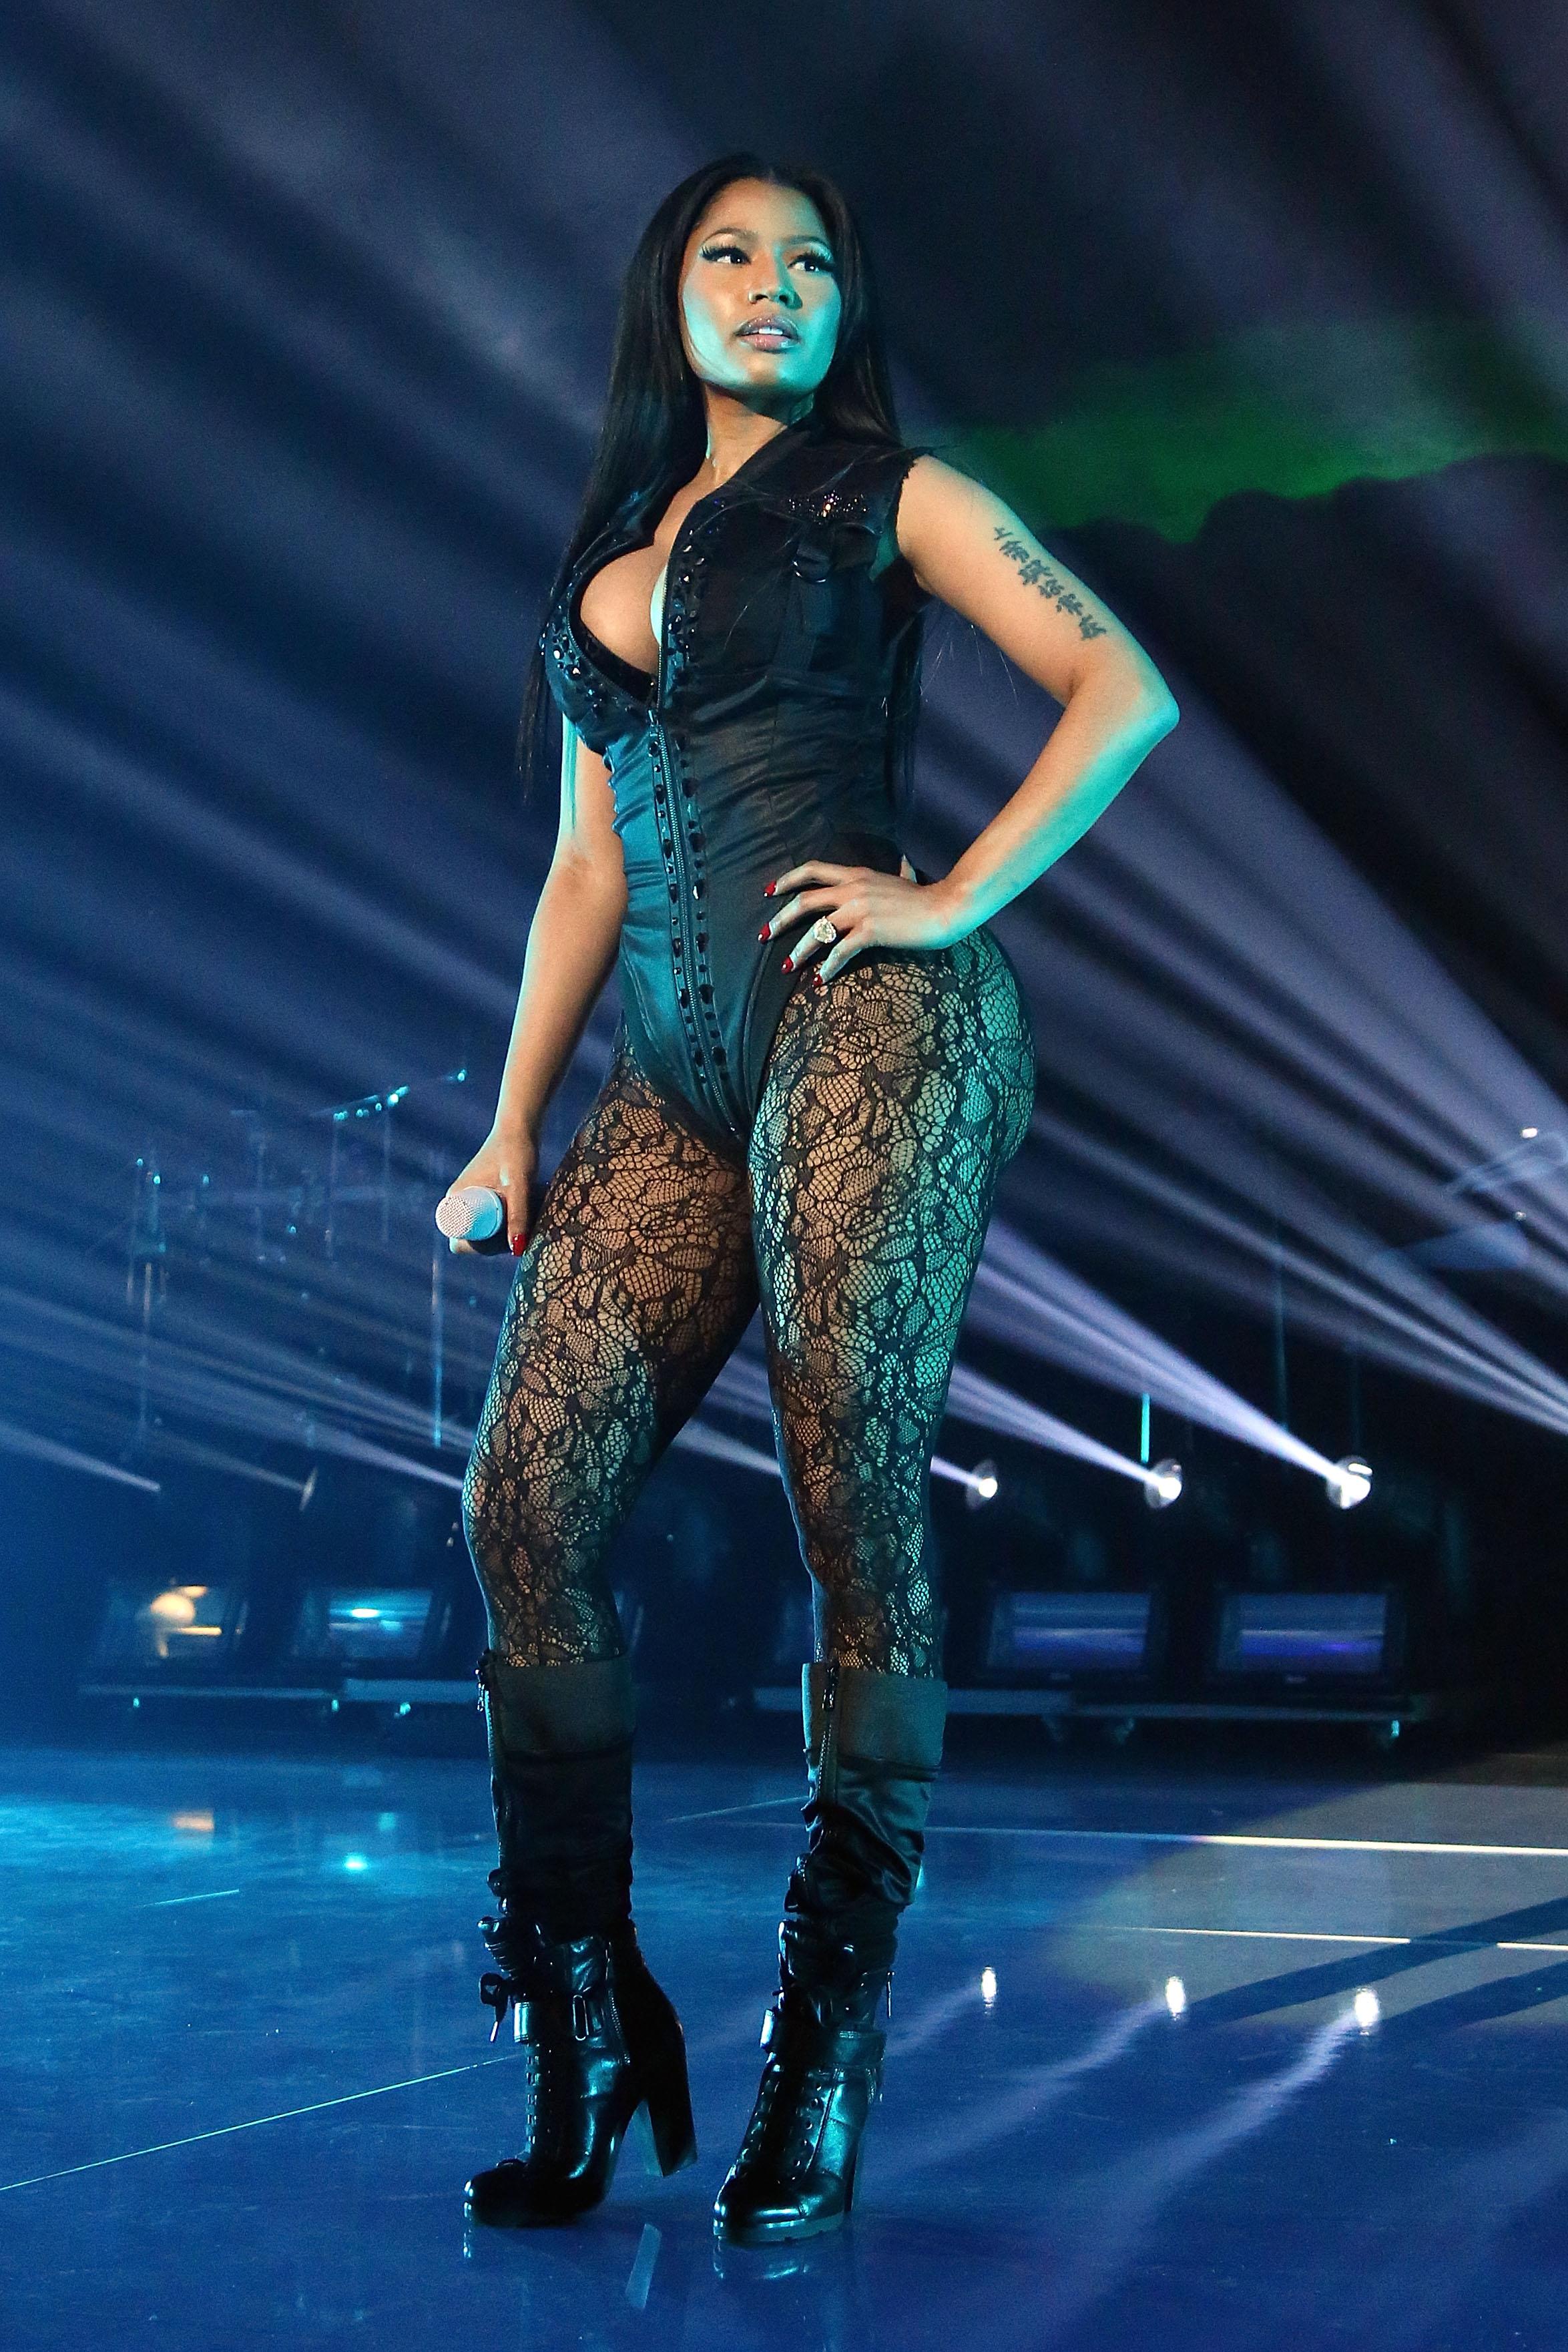 Nicki Minaj Argues Streaming Should Count Toward Album Sales